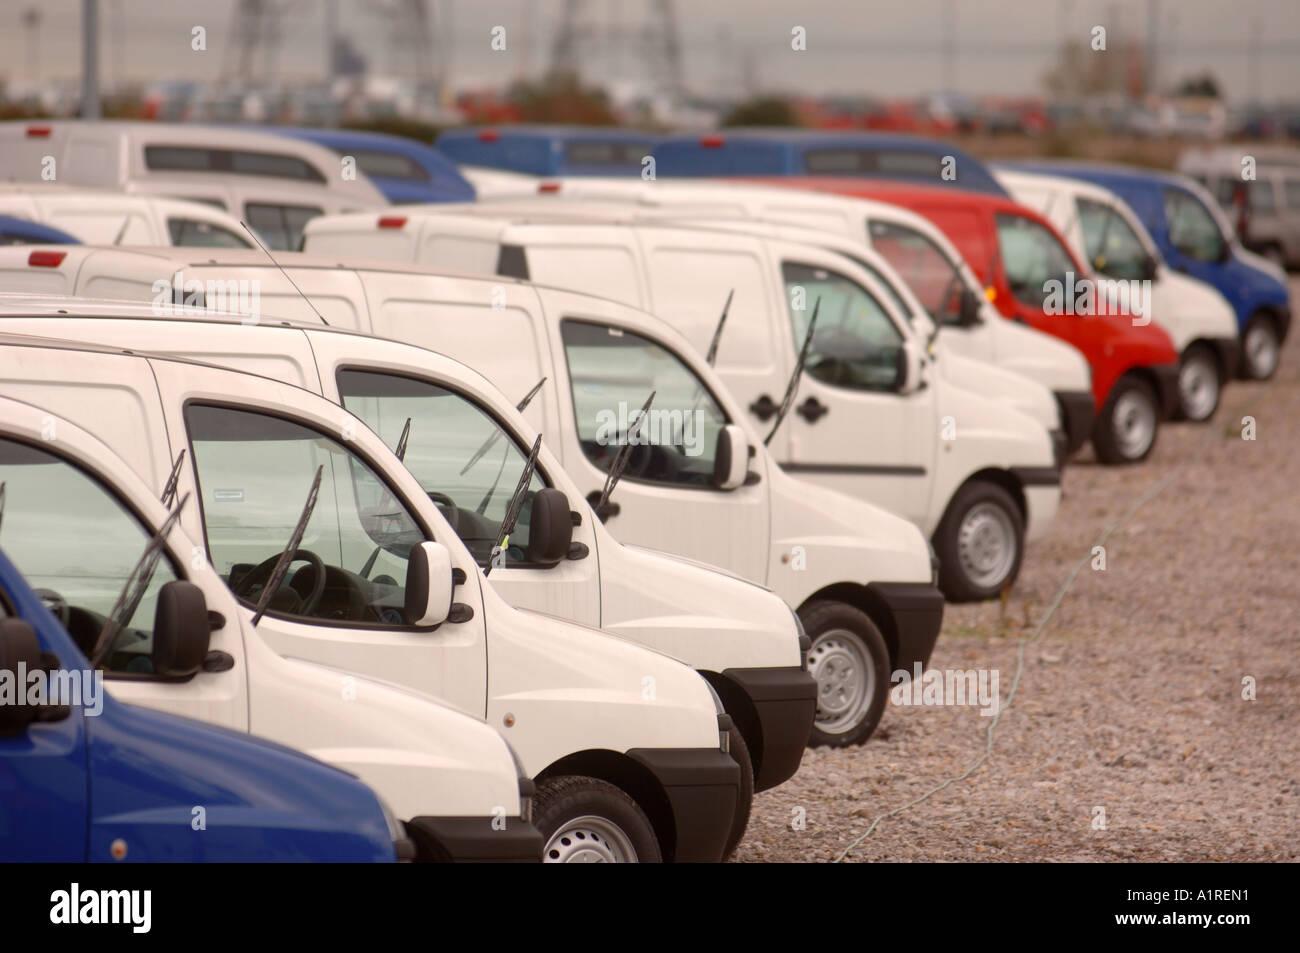 New Fiat Doblo Cargo Vans Parked At Avonmouth Docks Near Bristol Uk